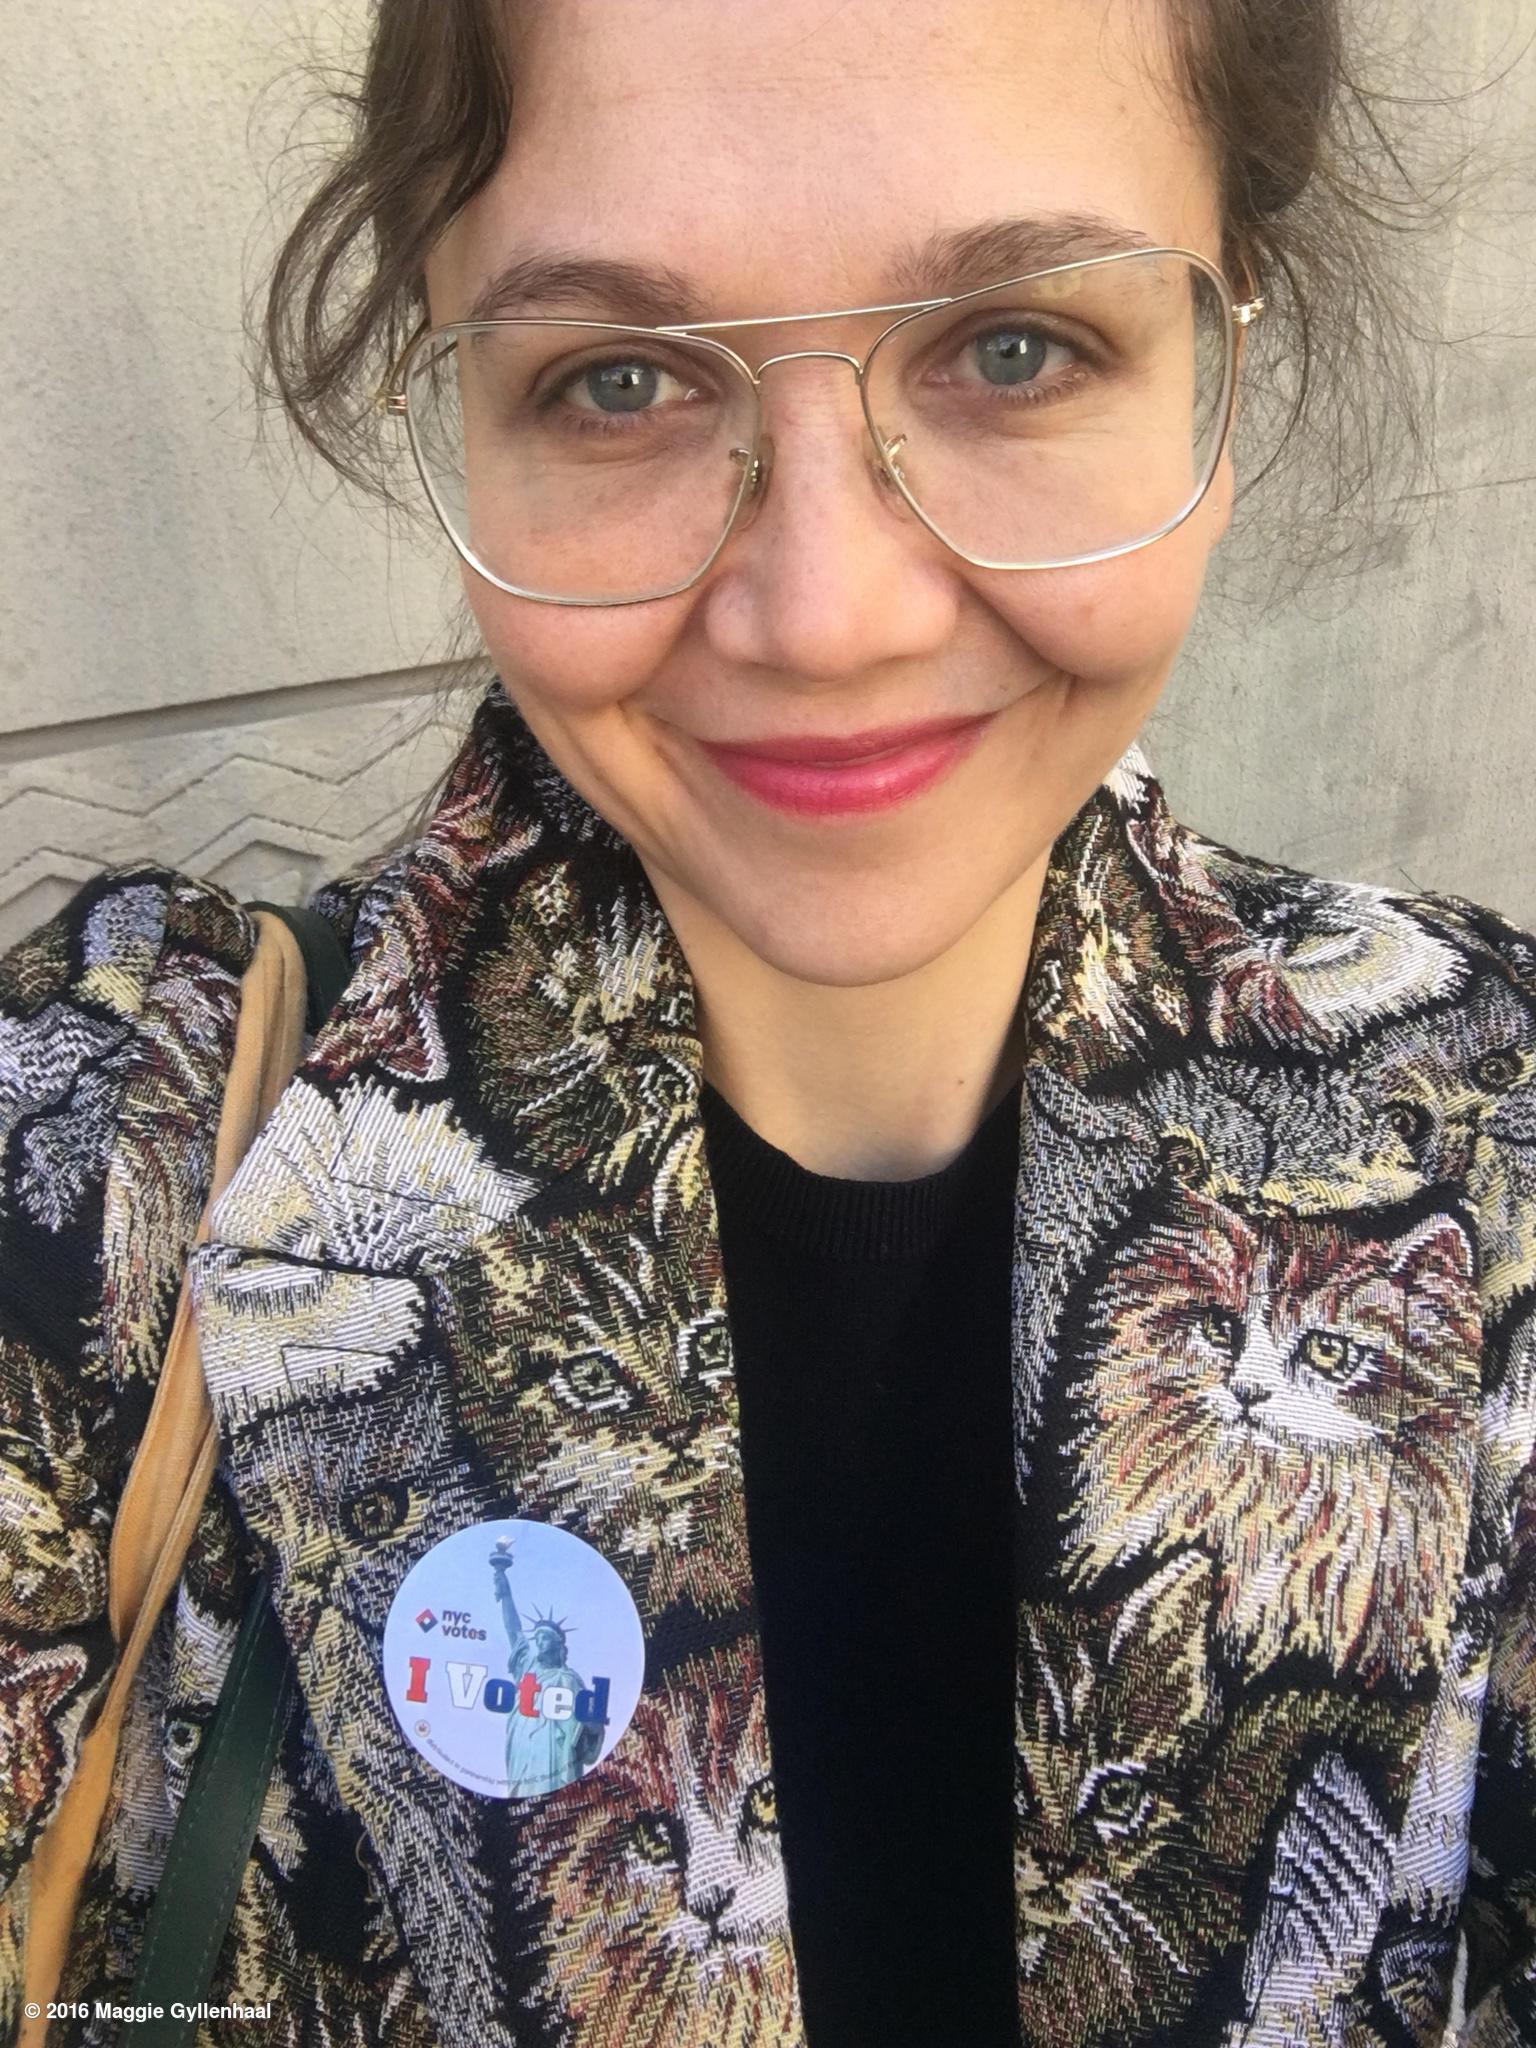 Maggie Gyllenhaal Pussy 51